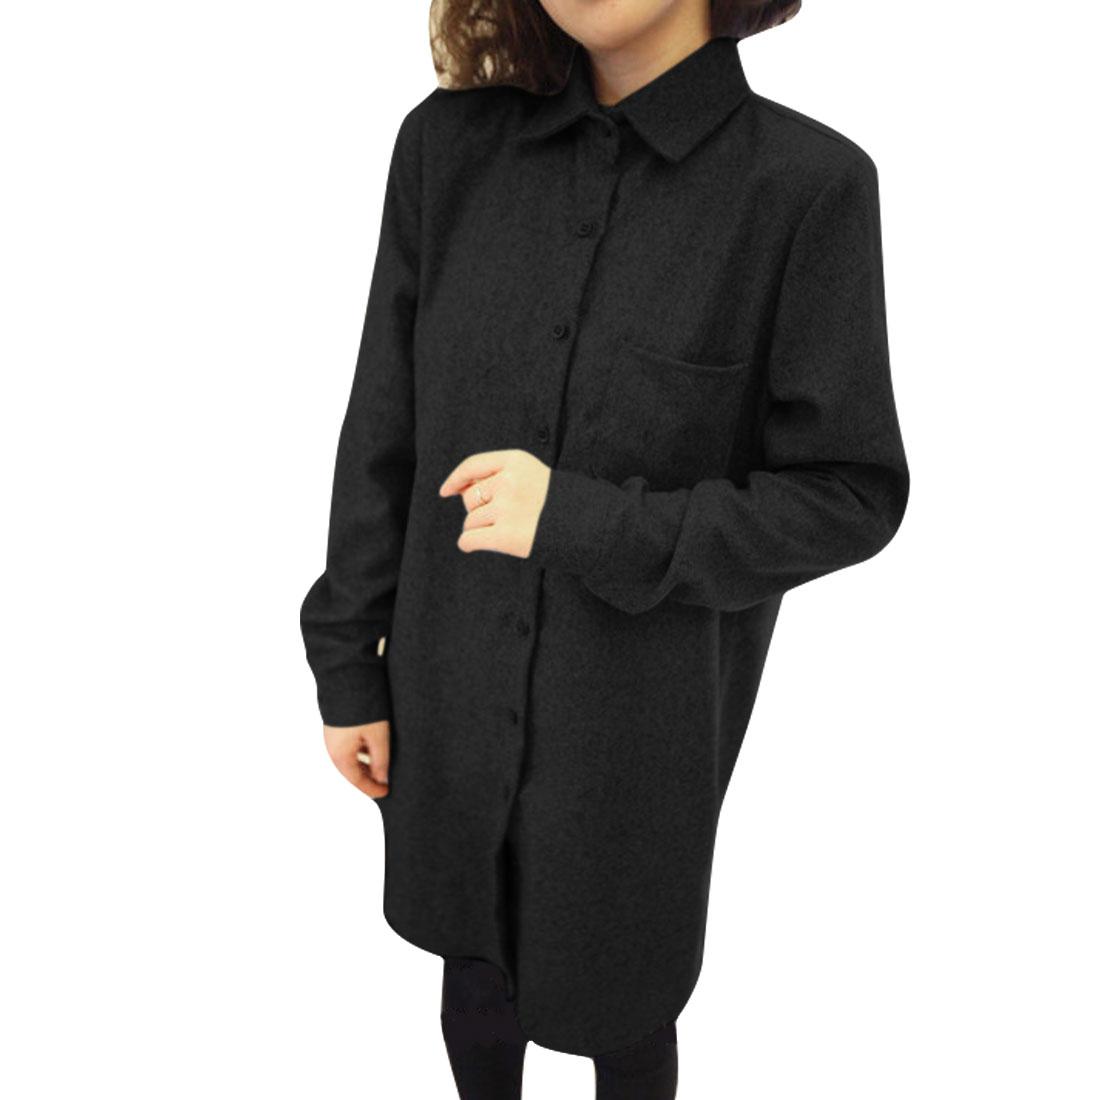 Women Button Up Long Sleeve Chest Pocket Shirt Black S